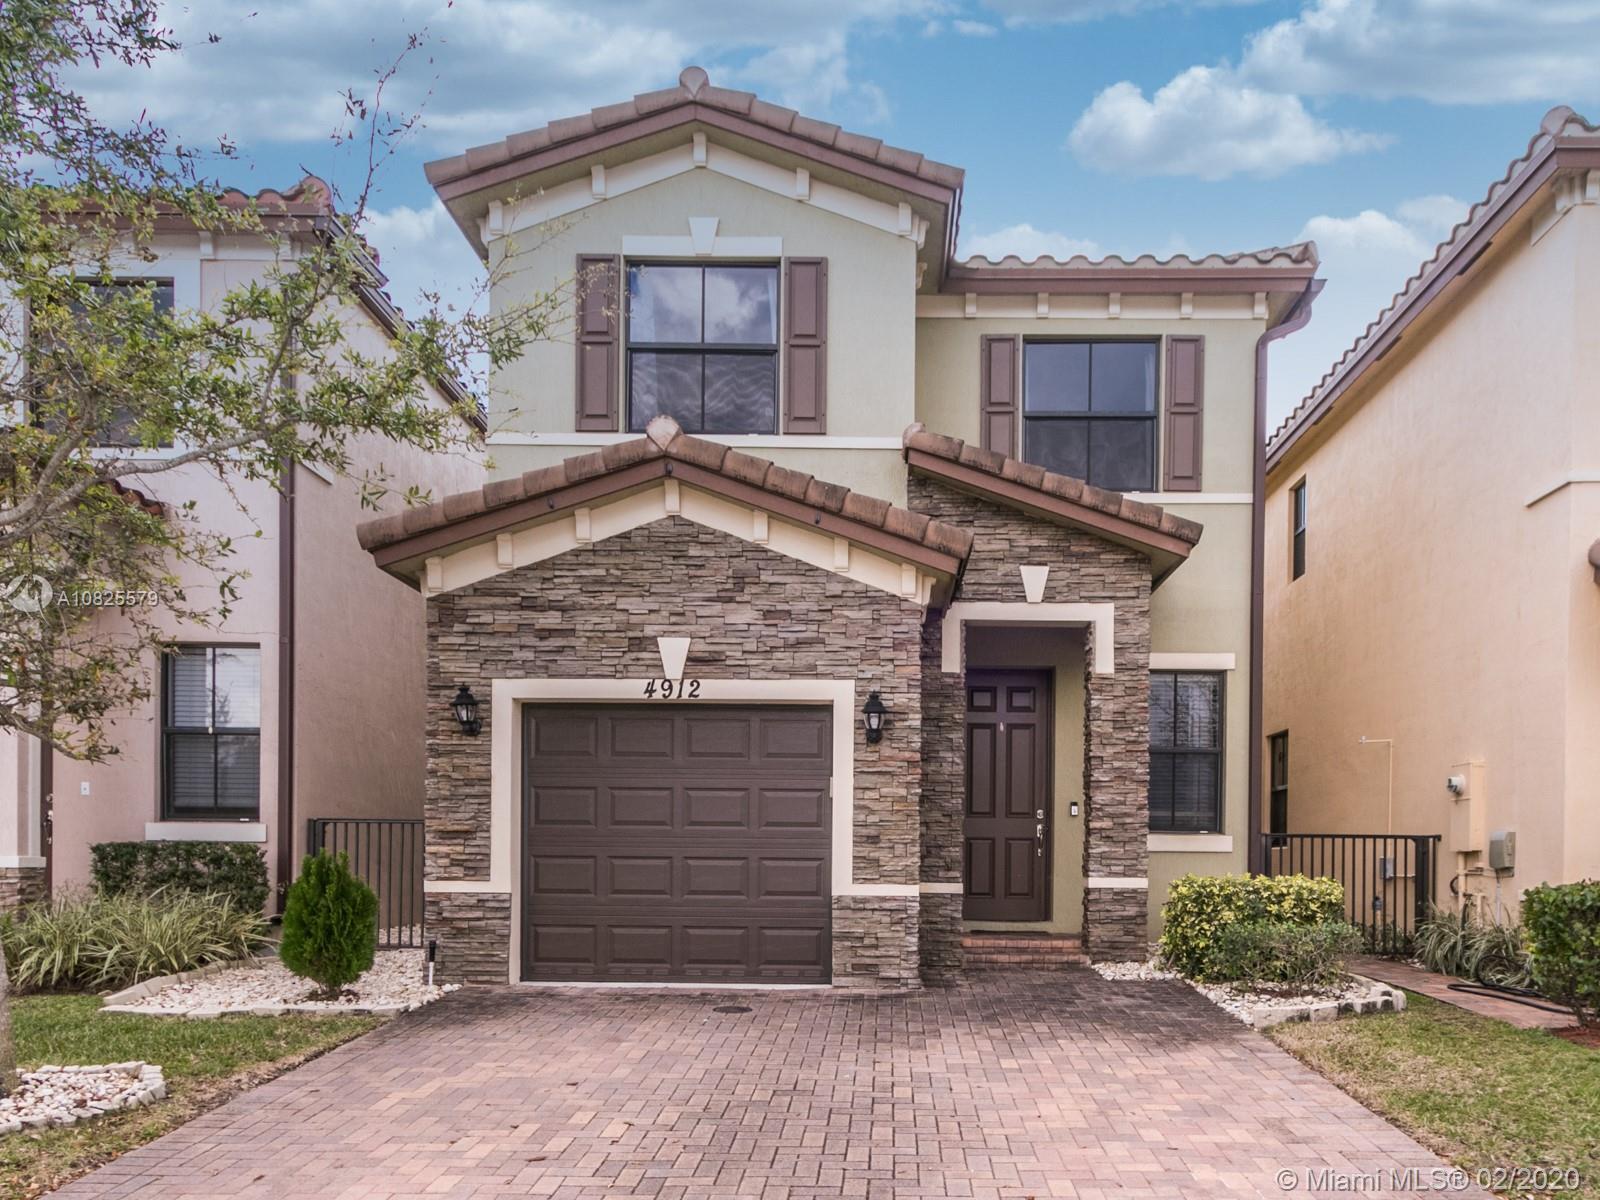 4912 NW 57th Ct, Tamarac, FL 33319 - Tamarac, FL real estate listing